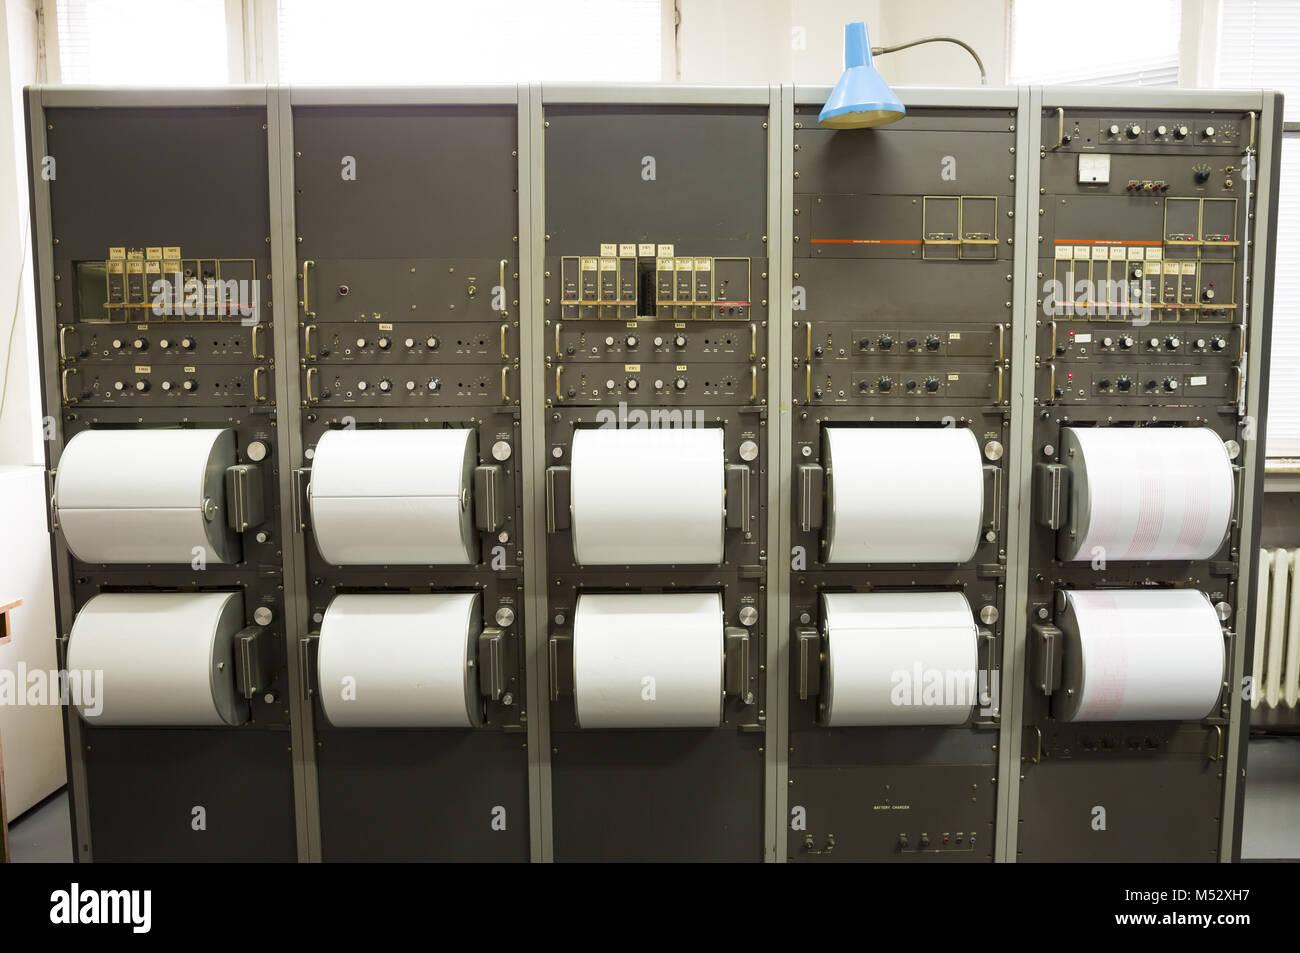 Five seismographs recording earthquakes - Stock Image